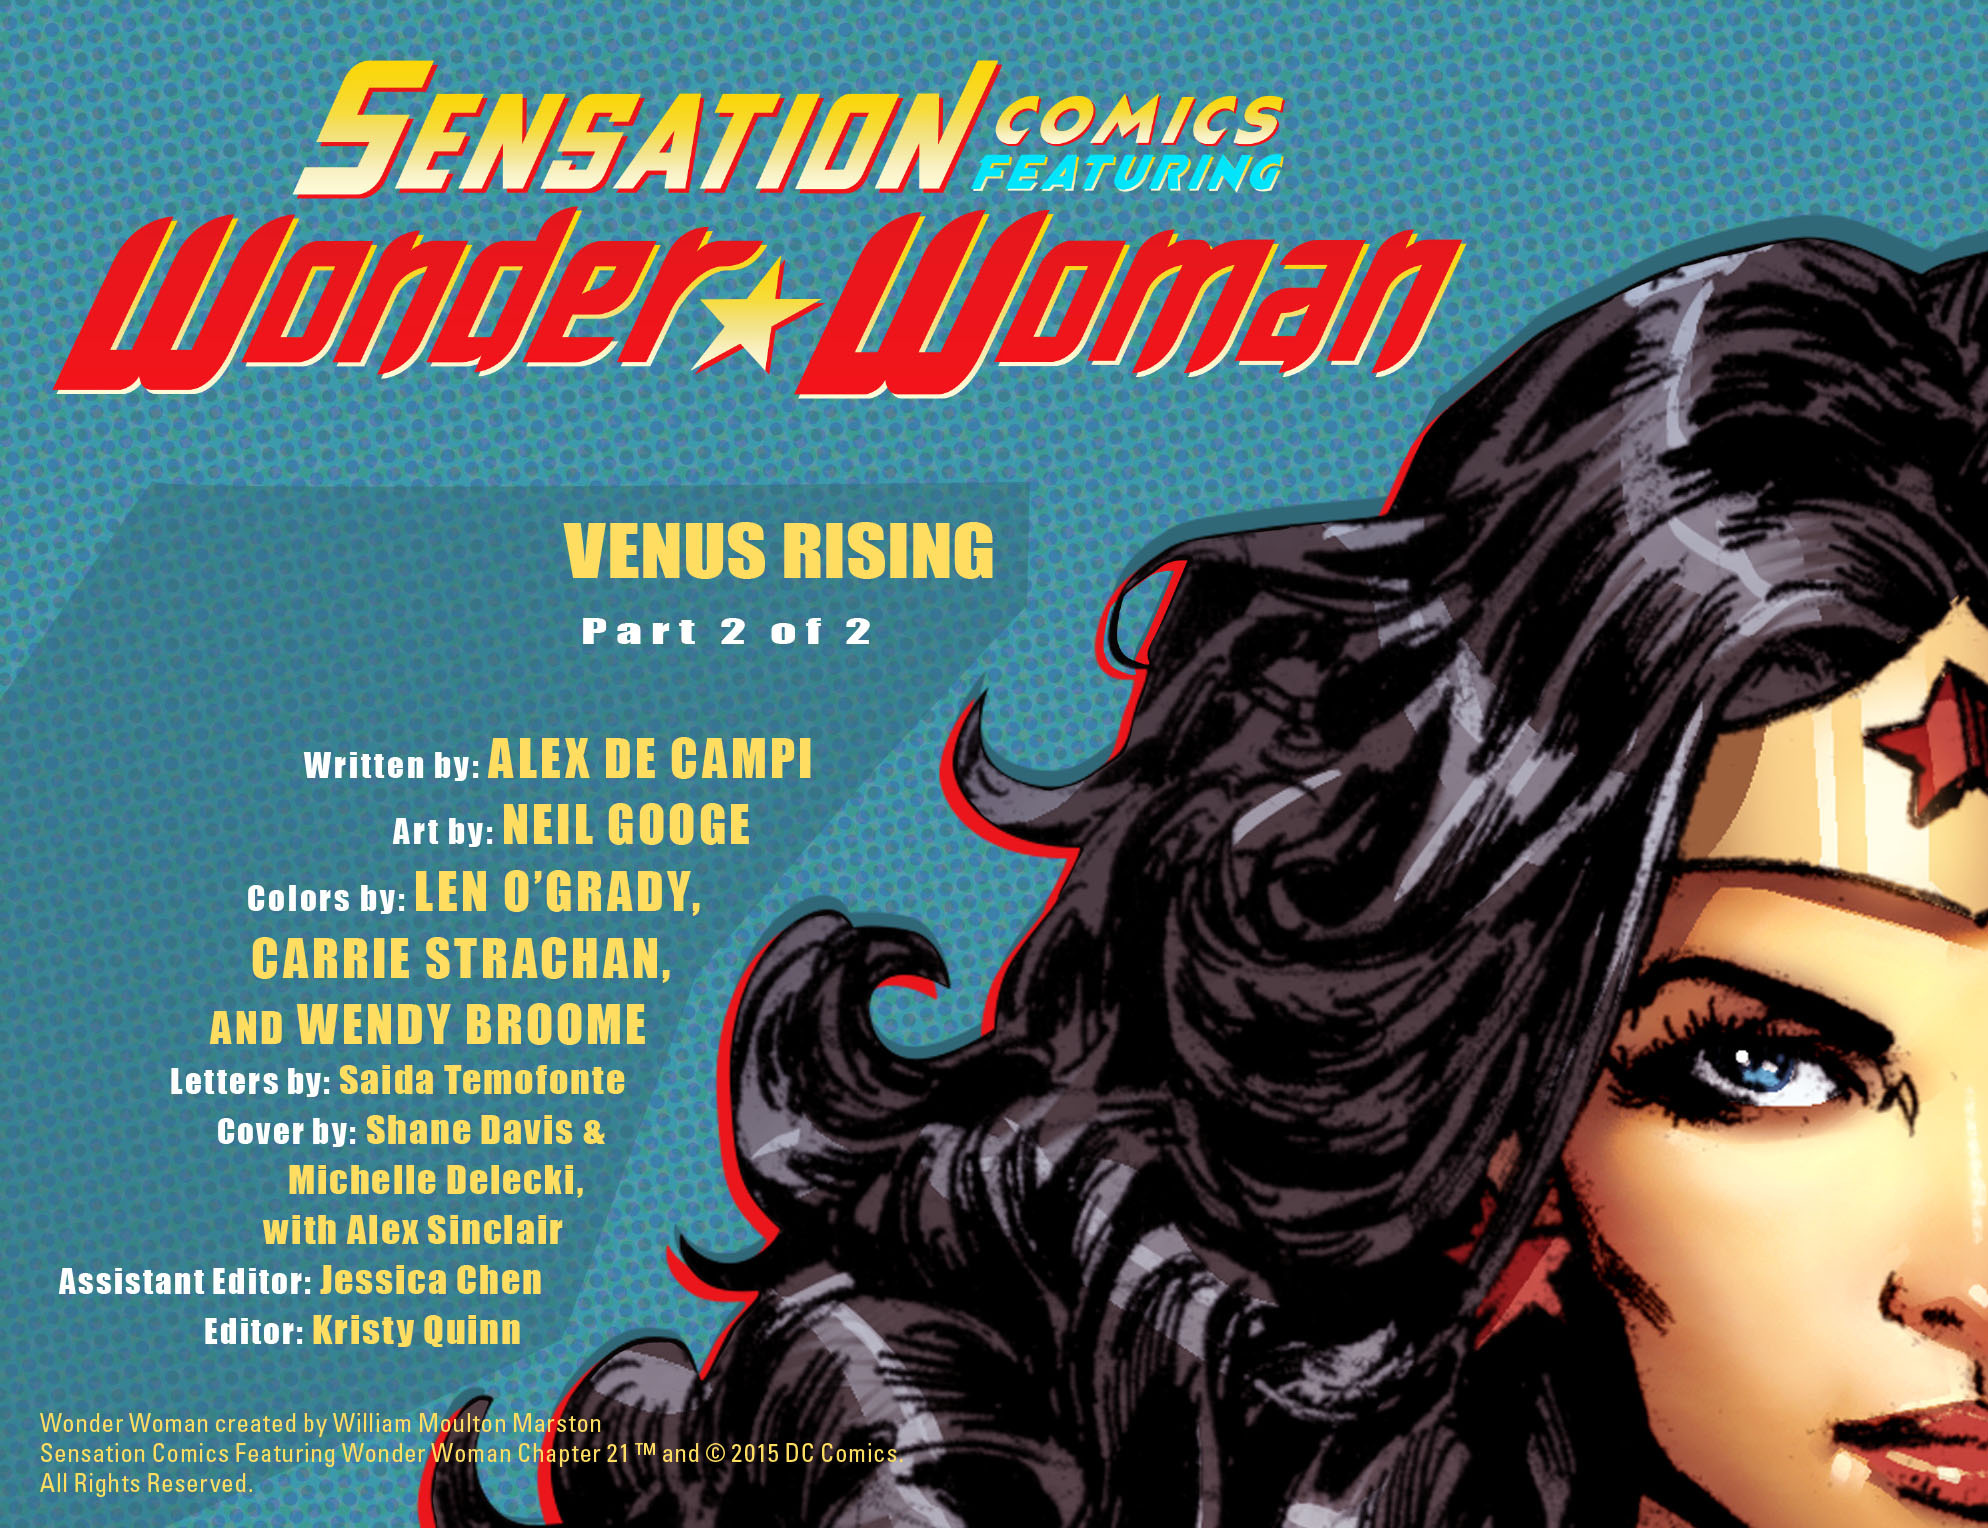 Read online Sensation Comics Featuring Wonder Woman comic -  Issue #21 - 2